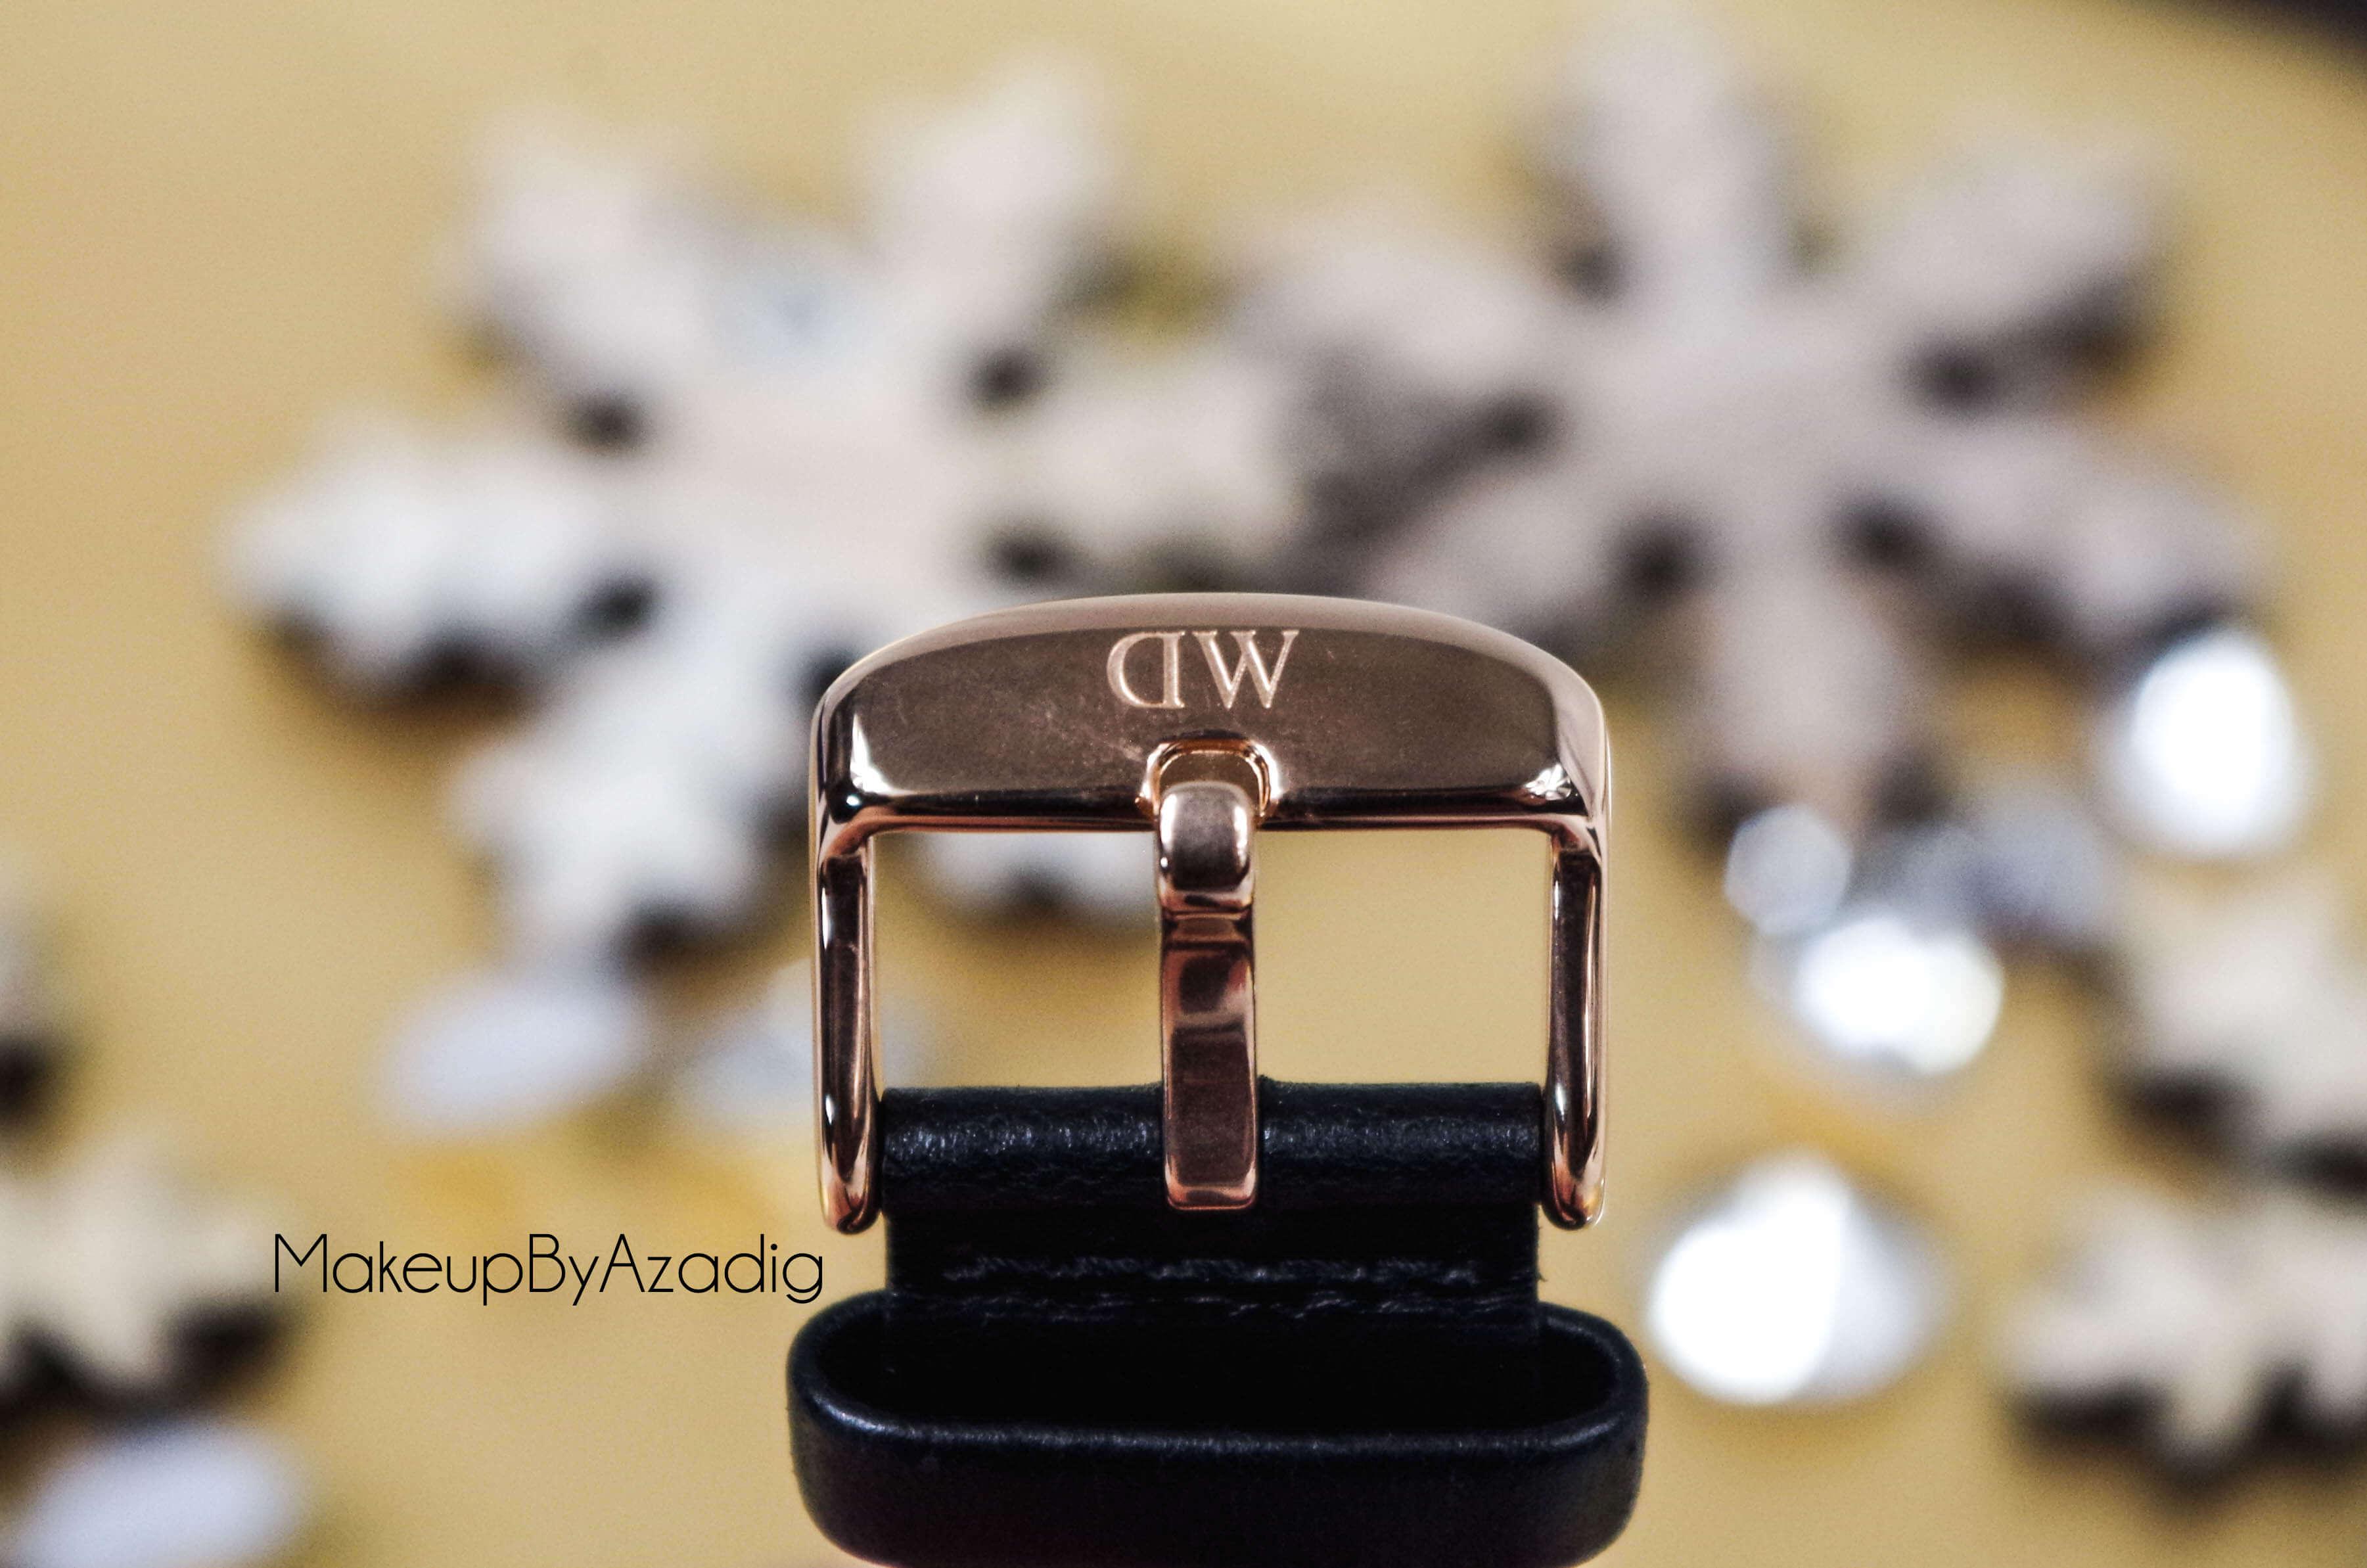 makeupbyazadig-daniel-wellington-montre-classic-black-sheffield-code-promo-troyes-paris-avis